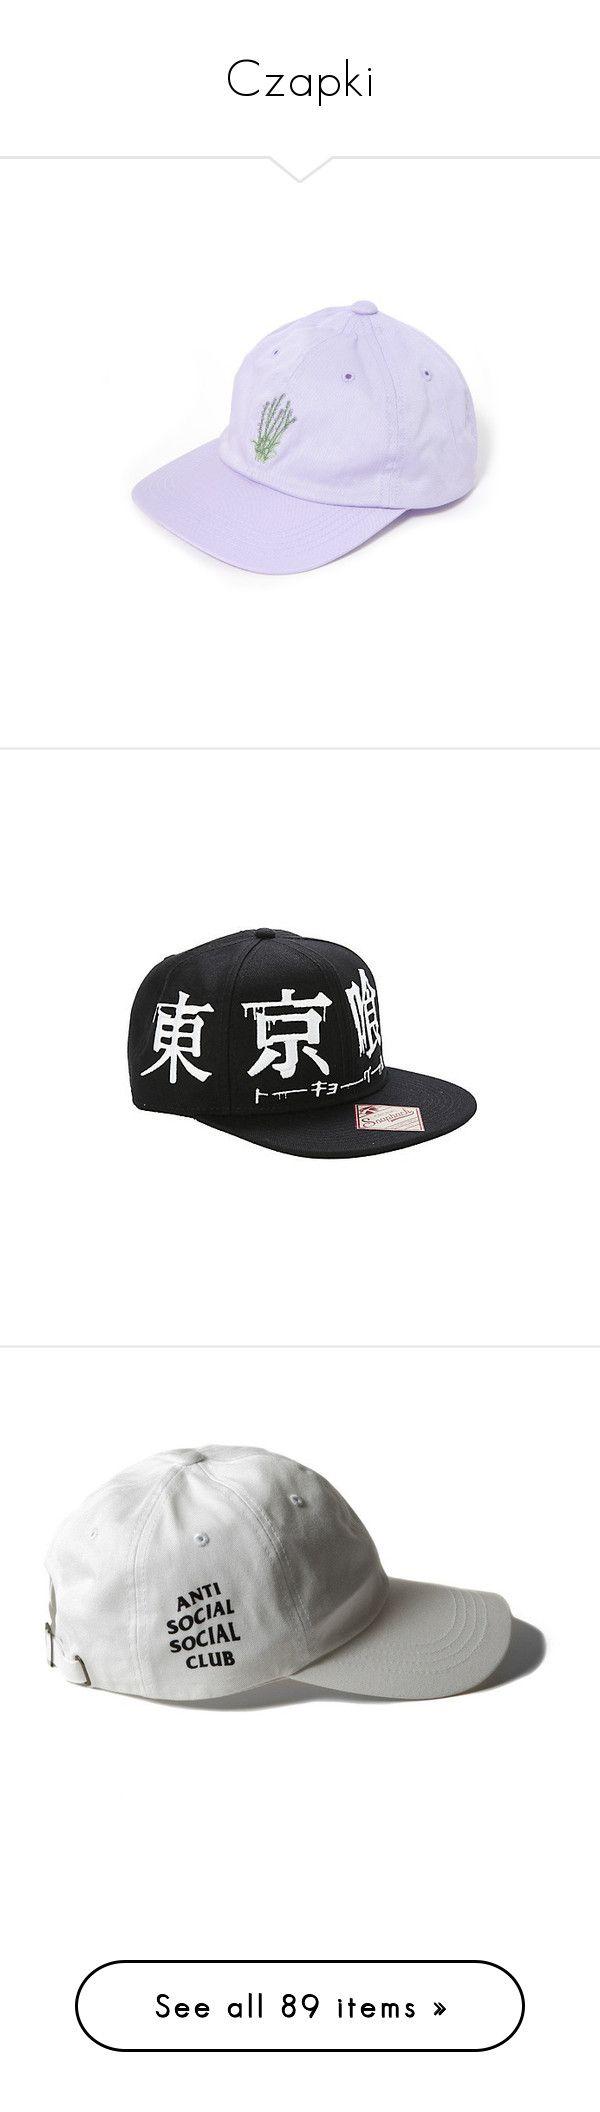 """Czapki"" by nataliastopczasu ❤ liked on Polyvore featuring accessories, hats, accessories - hats, embroidered snapback hats, snapback hats, embroidery hats, snap back hats, embroidered hats, white crown and crown cap"